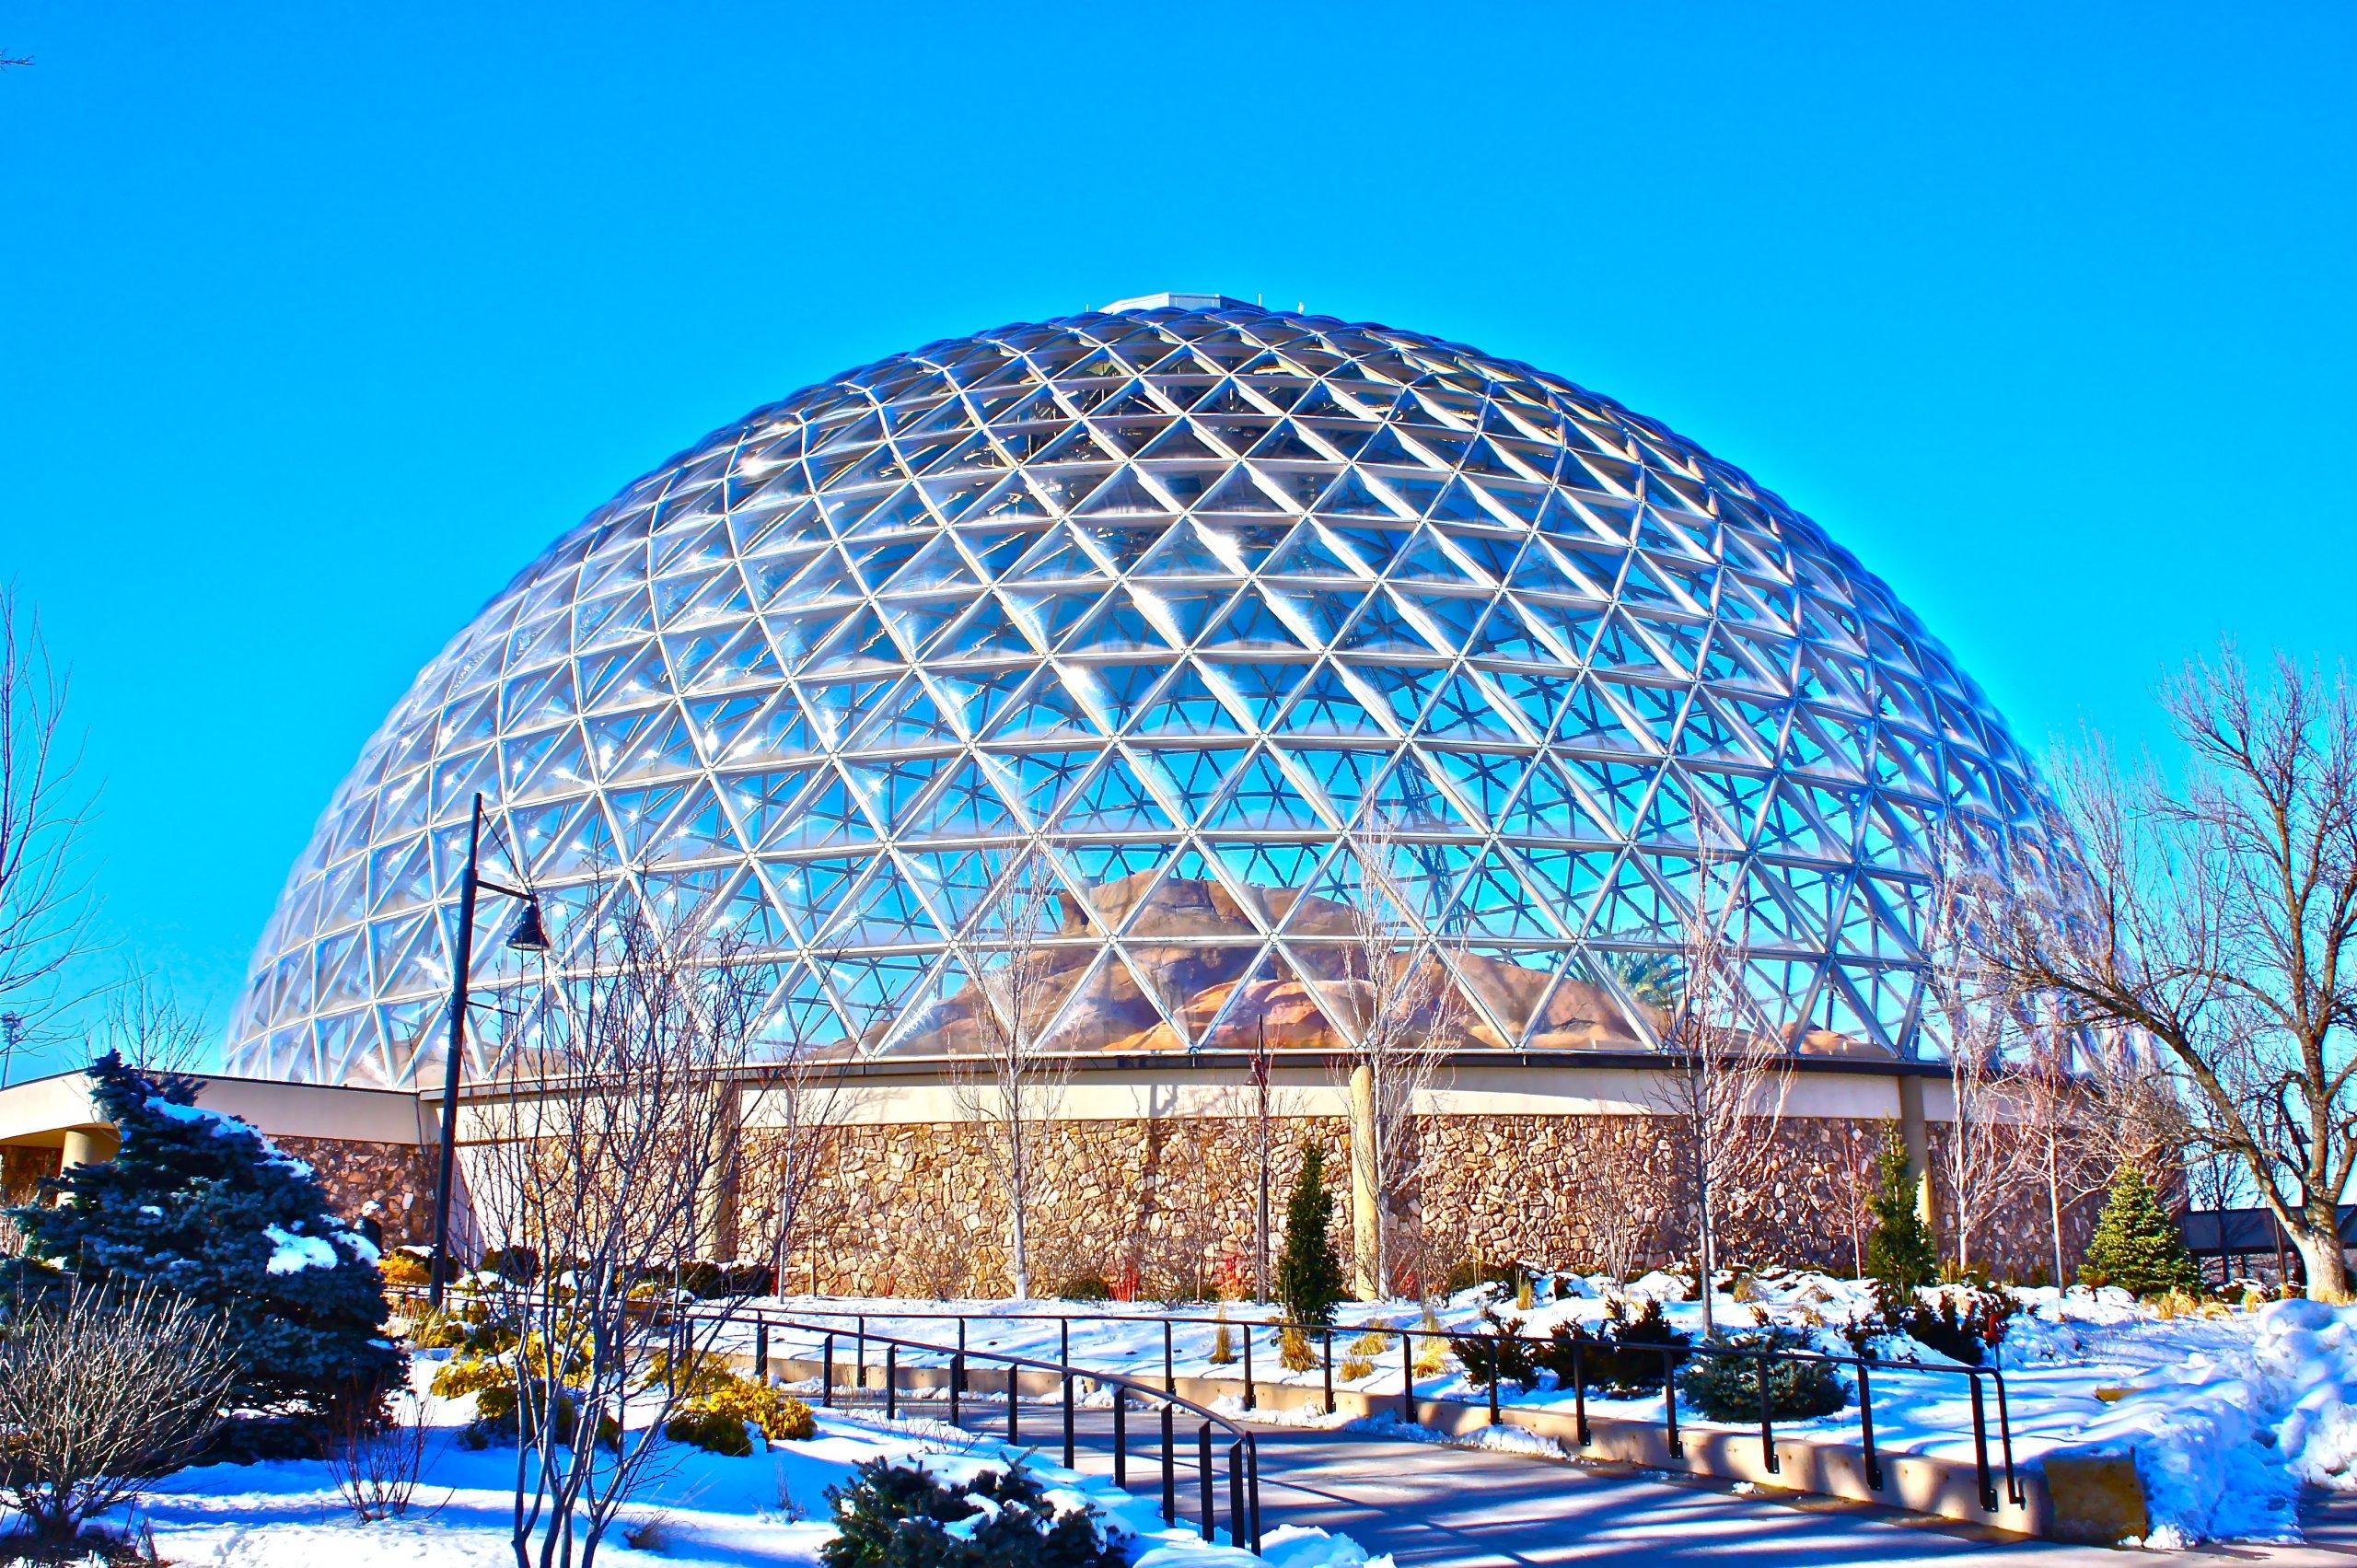 Omaha's Henry Doorly Zoo and Aquarium, Nebraska